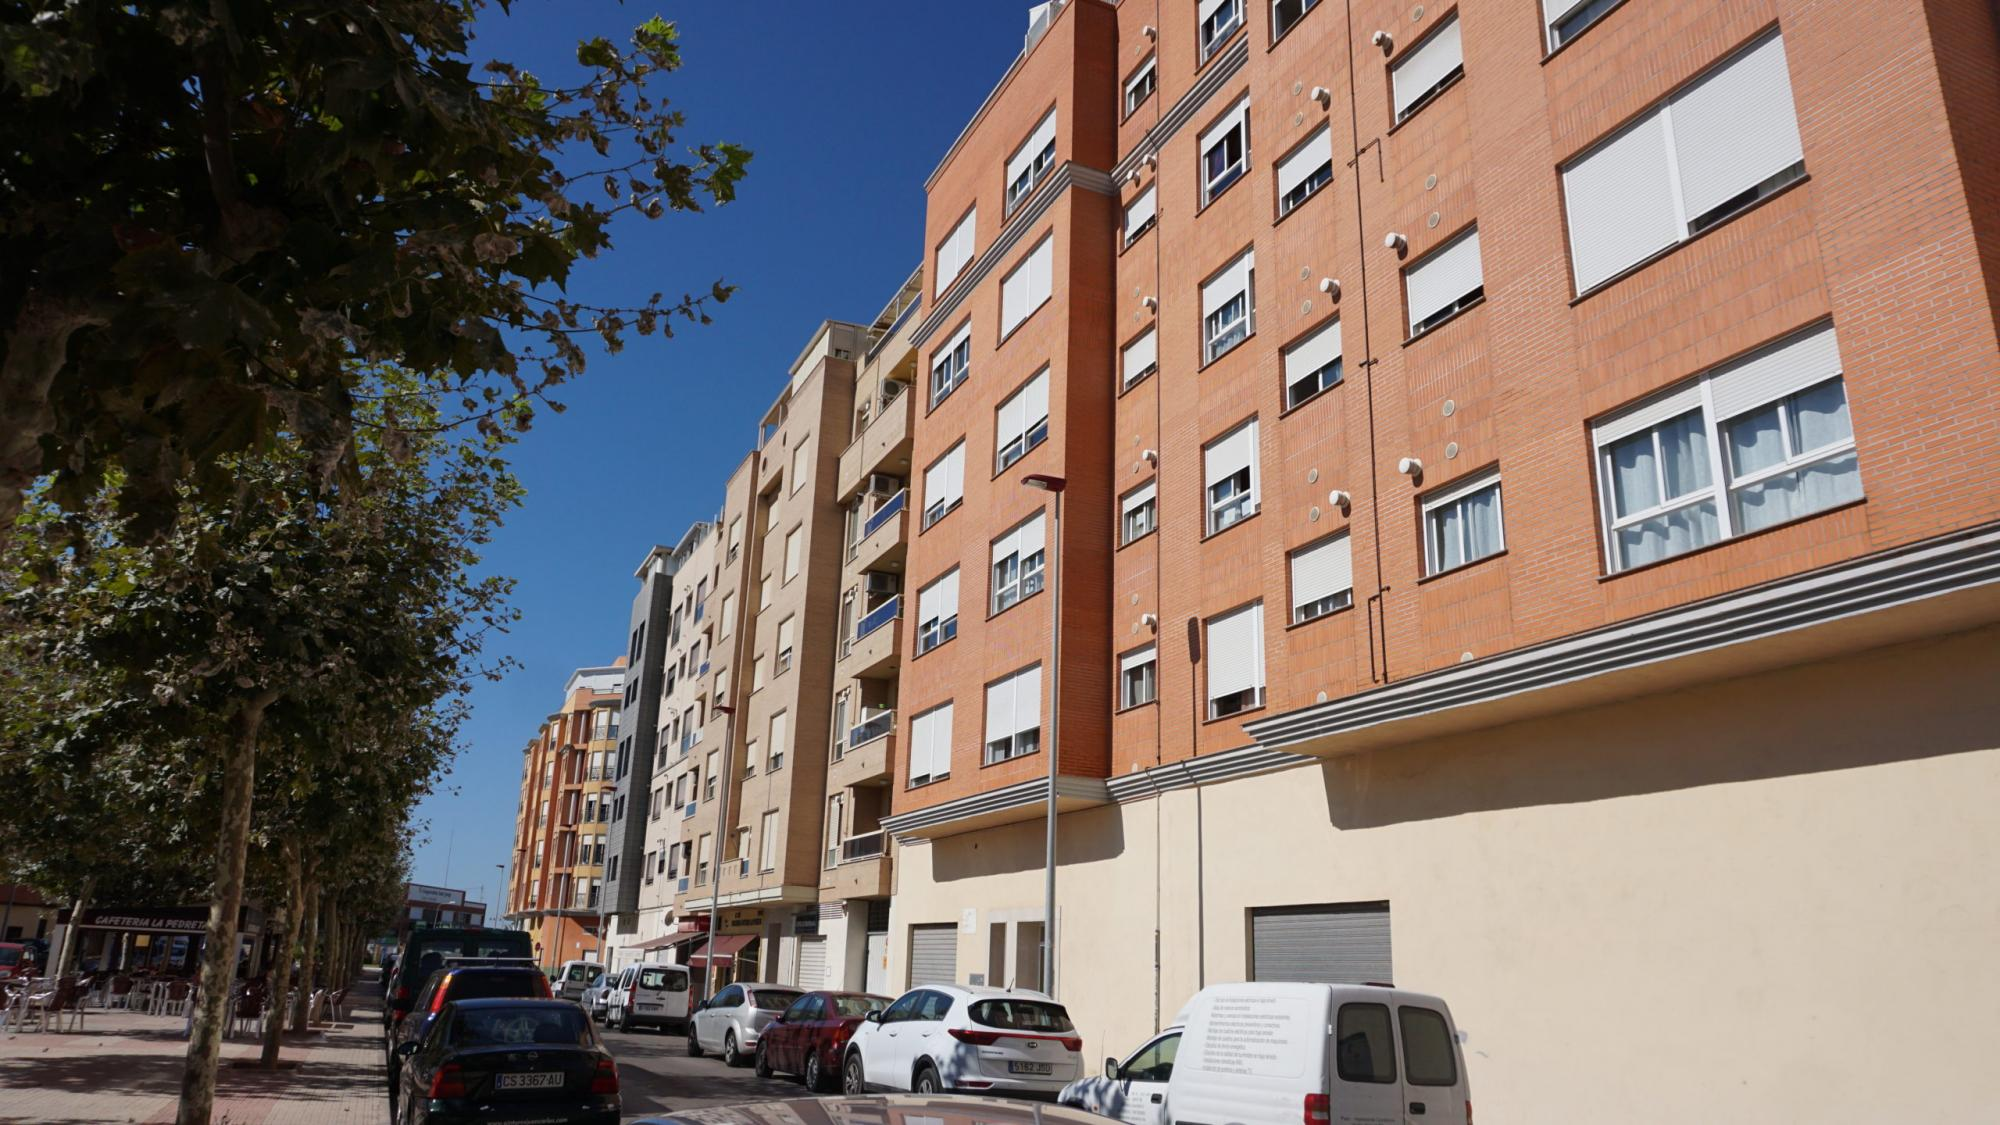 Ático en venta en Burriana (Castellón) zona Llombai